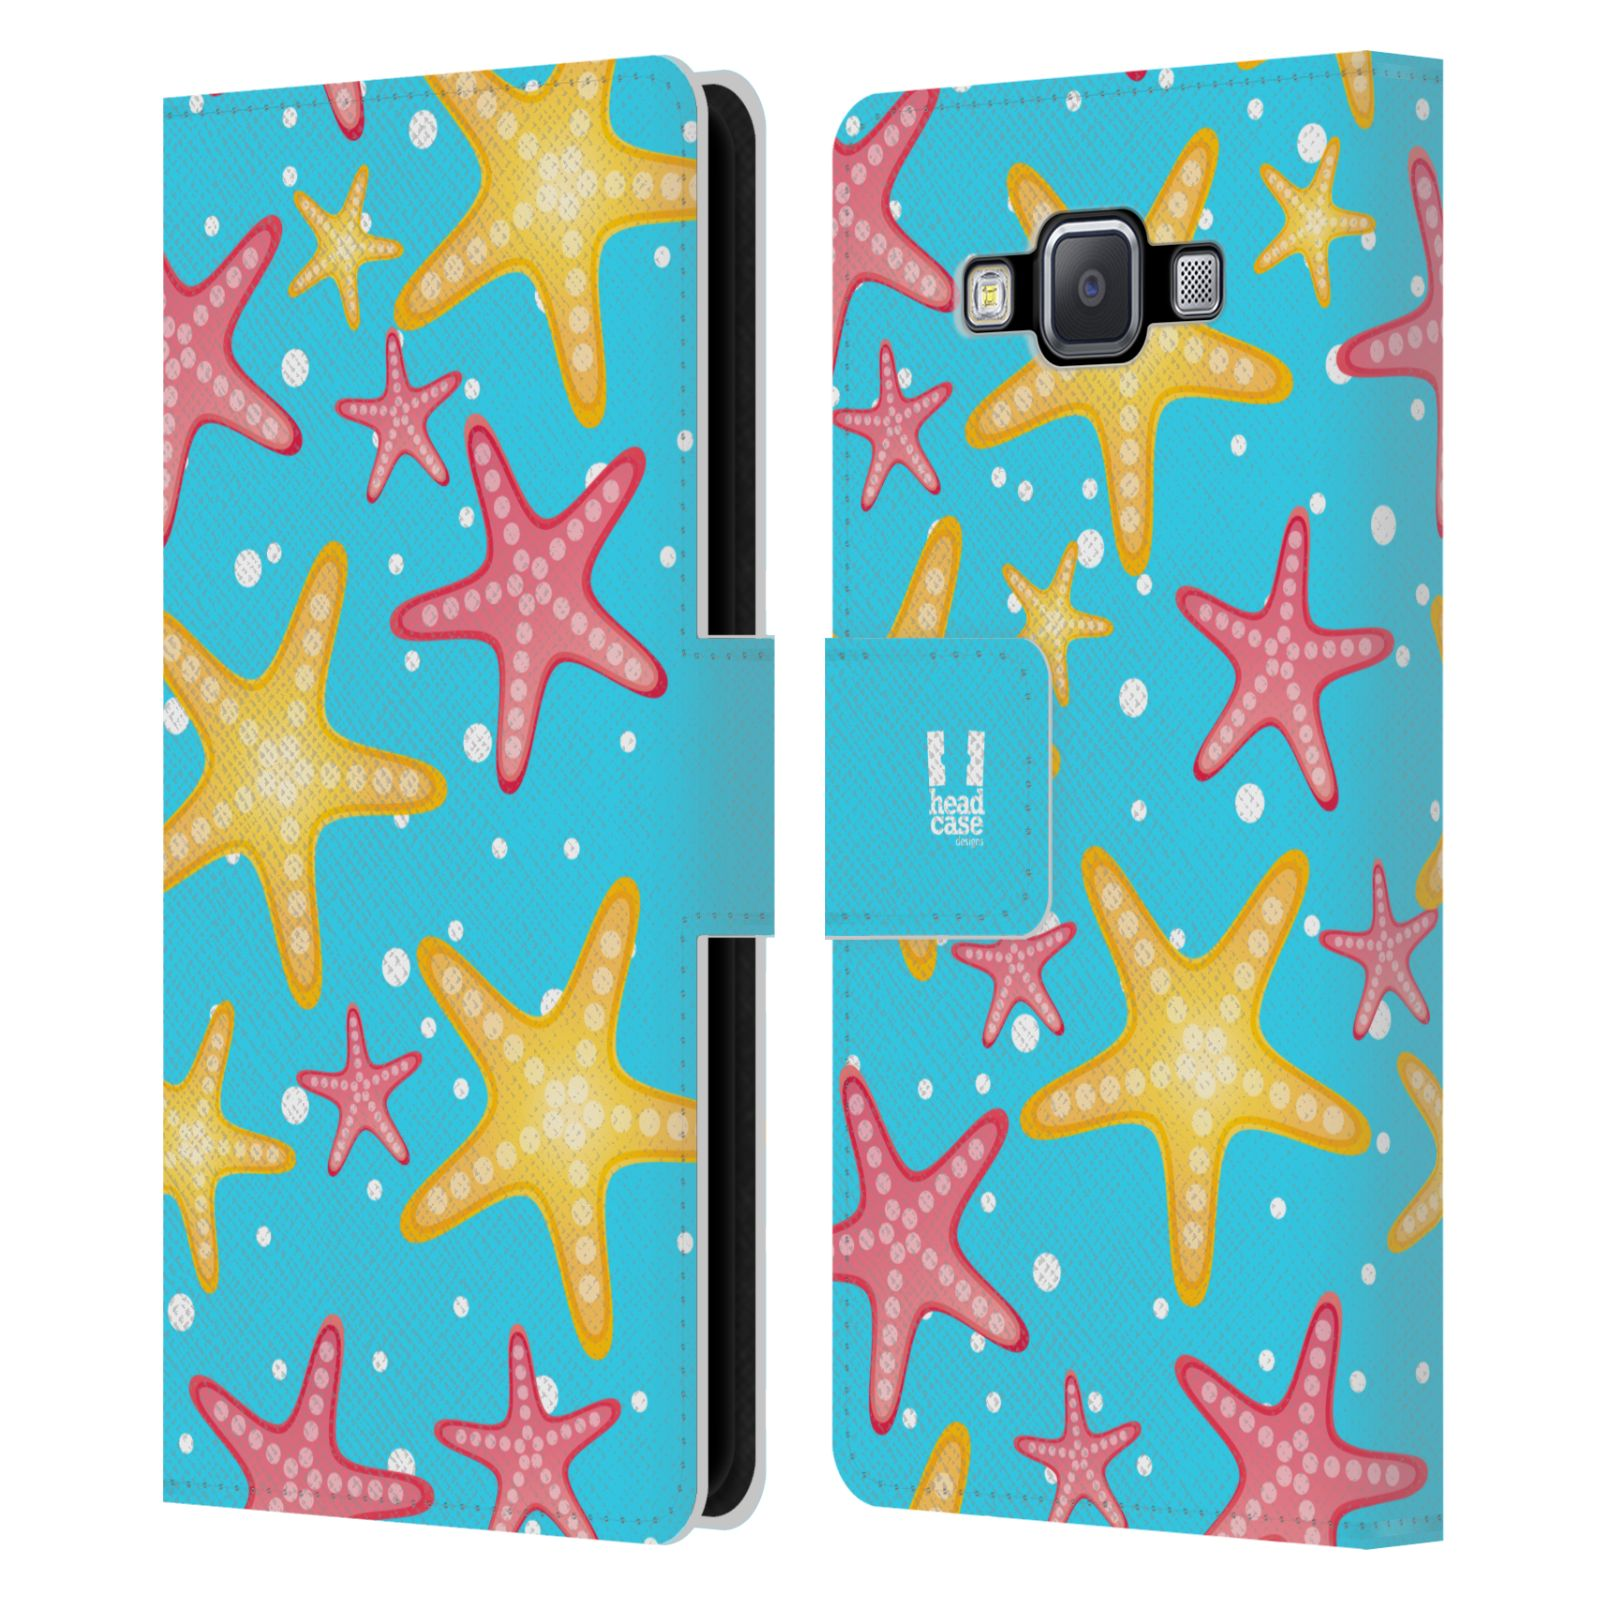 HEAD CASE Flipové pouzdro pro mobil Samsung Galaxy A5 Mořský živočich hvězdice modrá barva pozadí